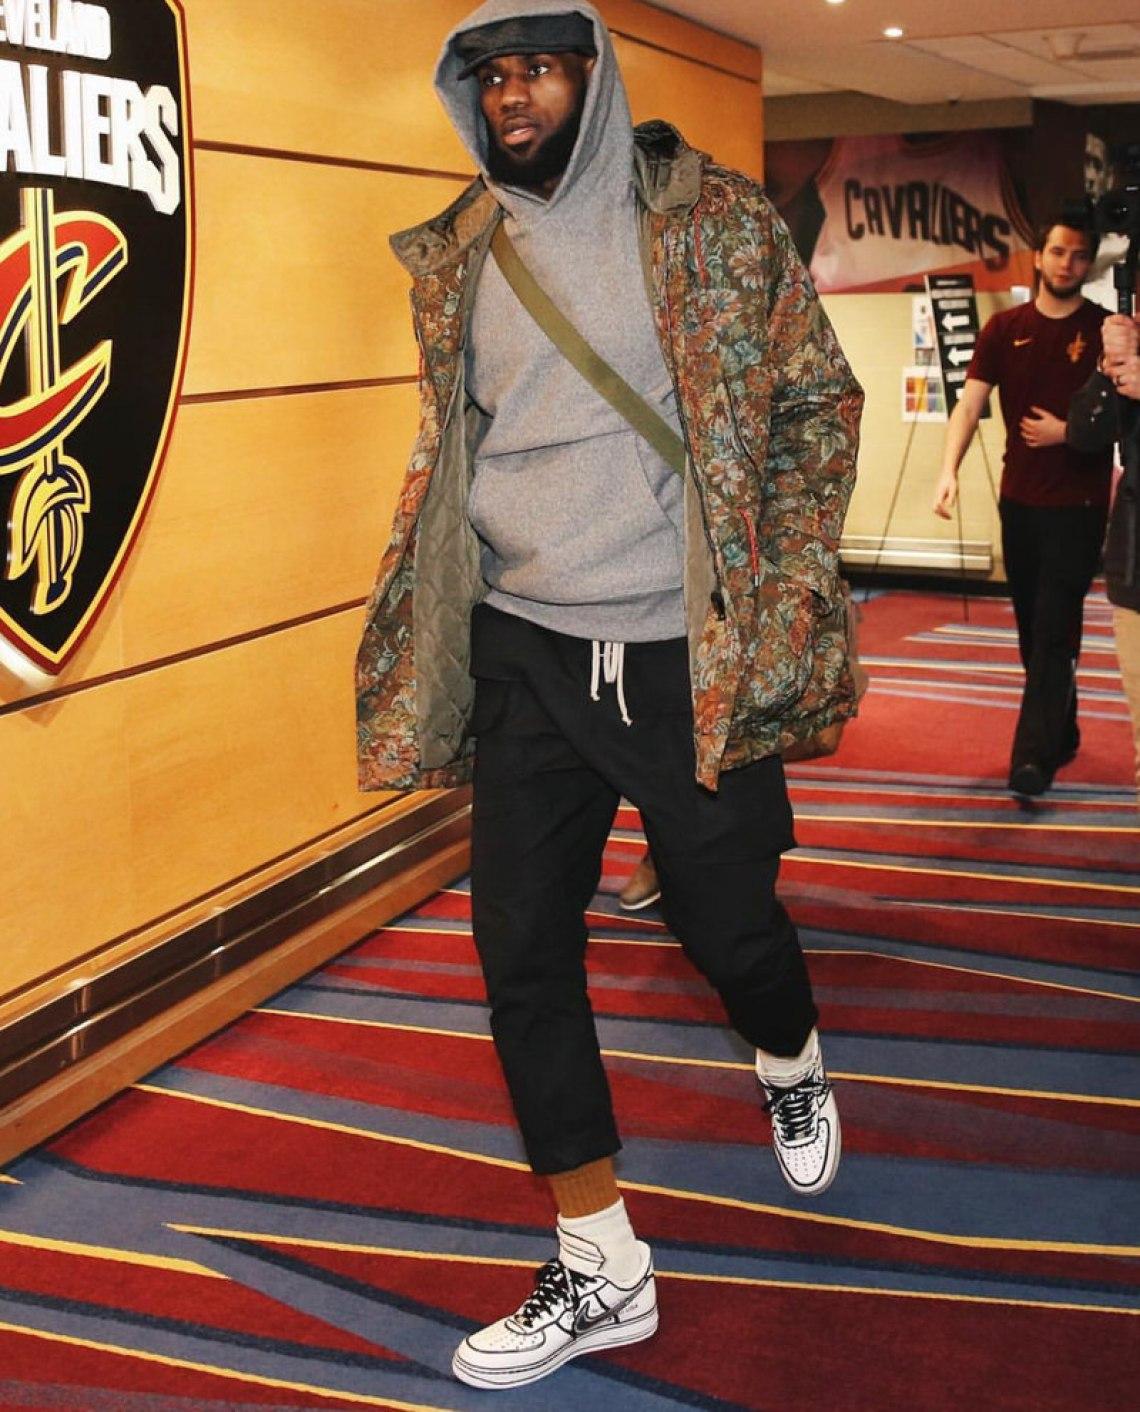 e04443f6f755ed ... x adidas Ozweego LeBron James in custom Nike Air Force 1 Lows by Joshua  Vides ...